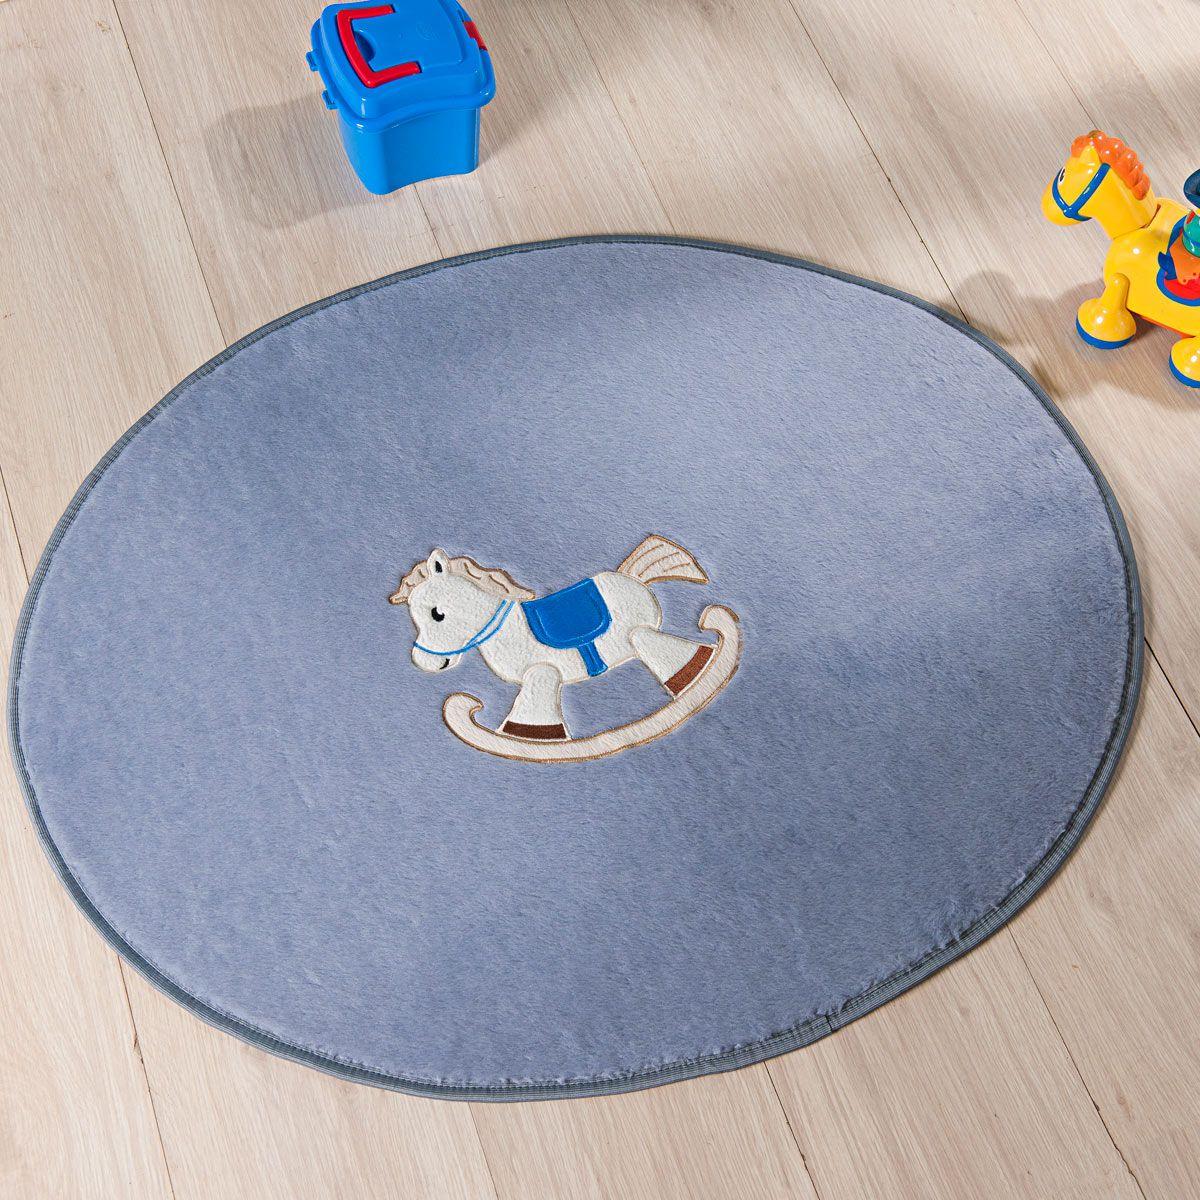 Tapete Infantil Premium Baby Formato Cavalinho Cinza Prata 78cm x 68cm